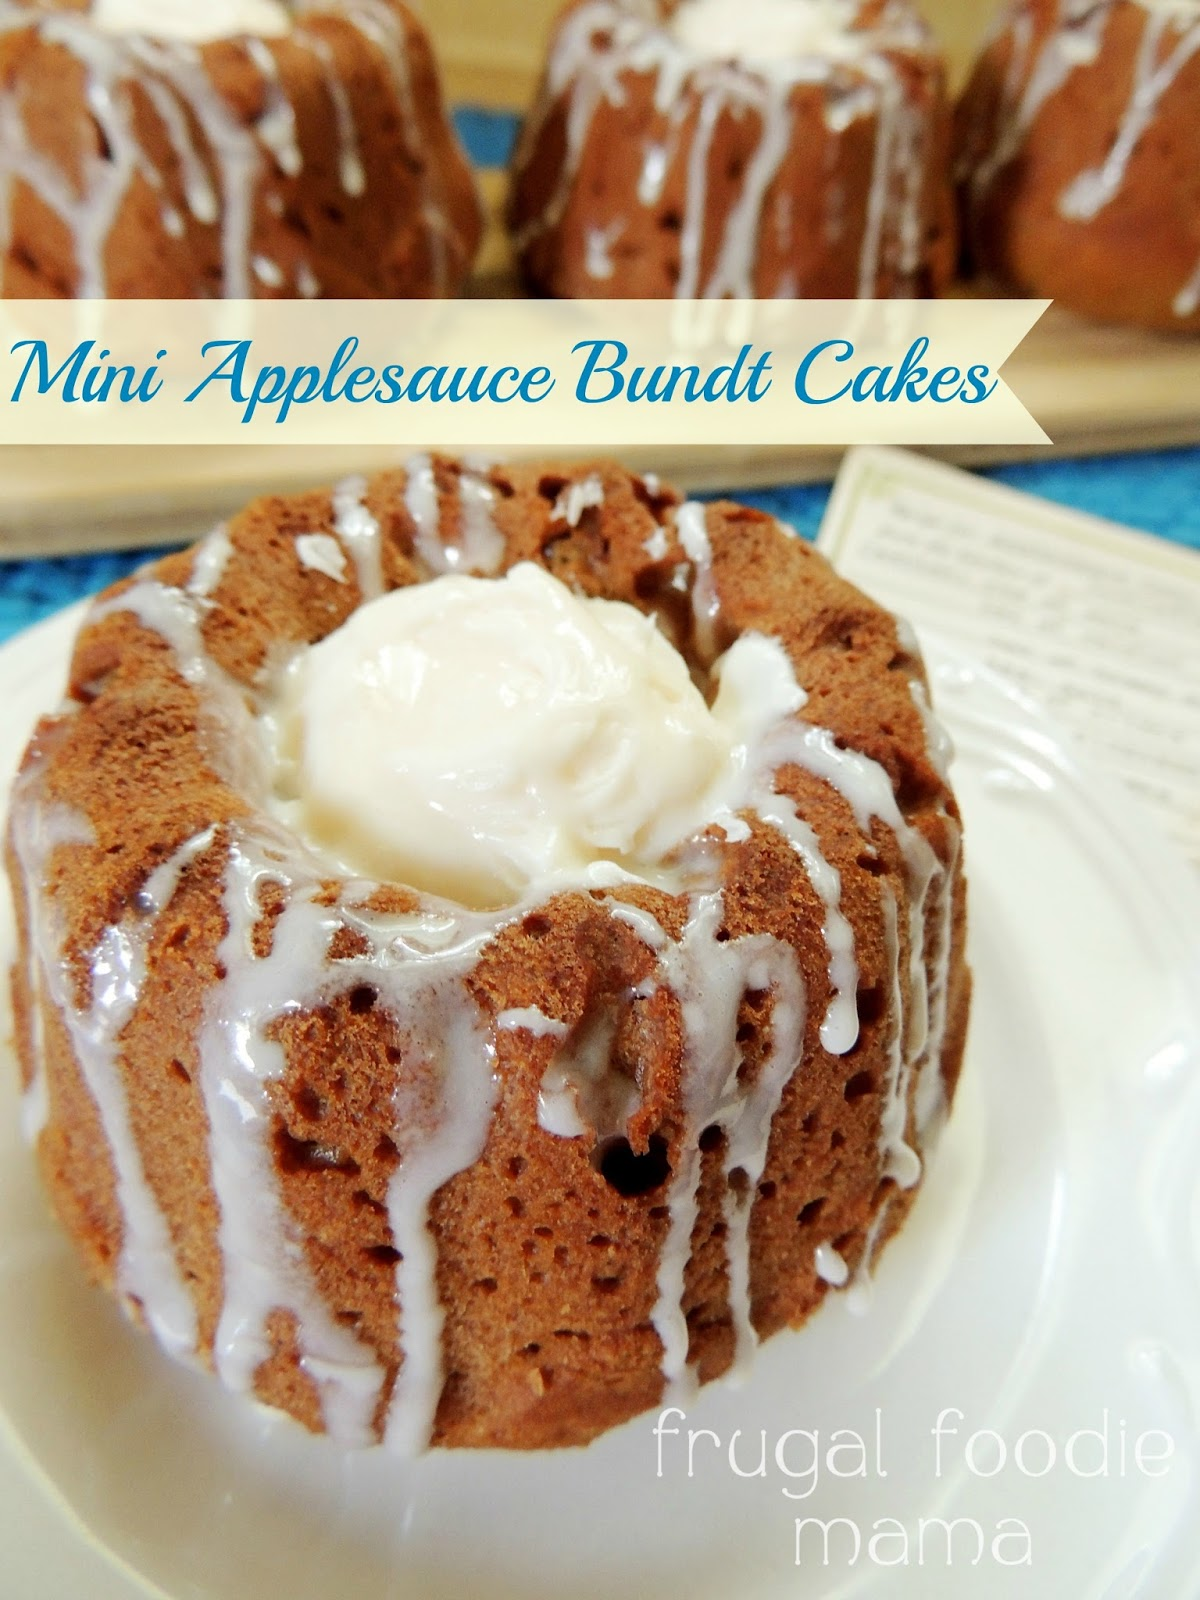 Honey Bun Cake Recipe With Applesauce